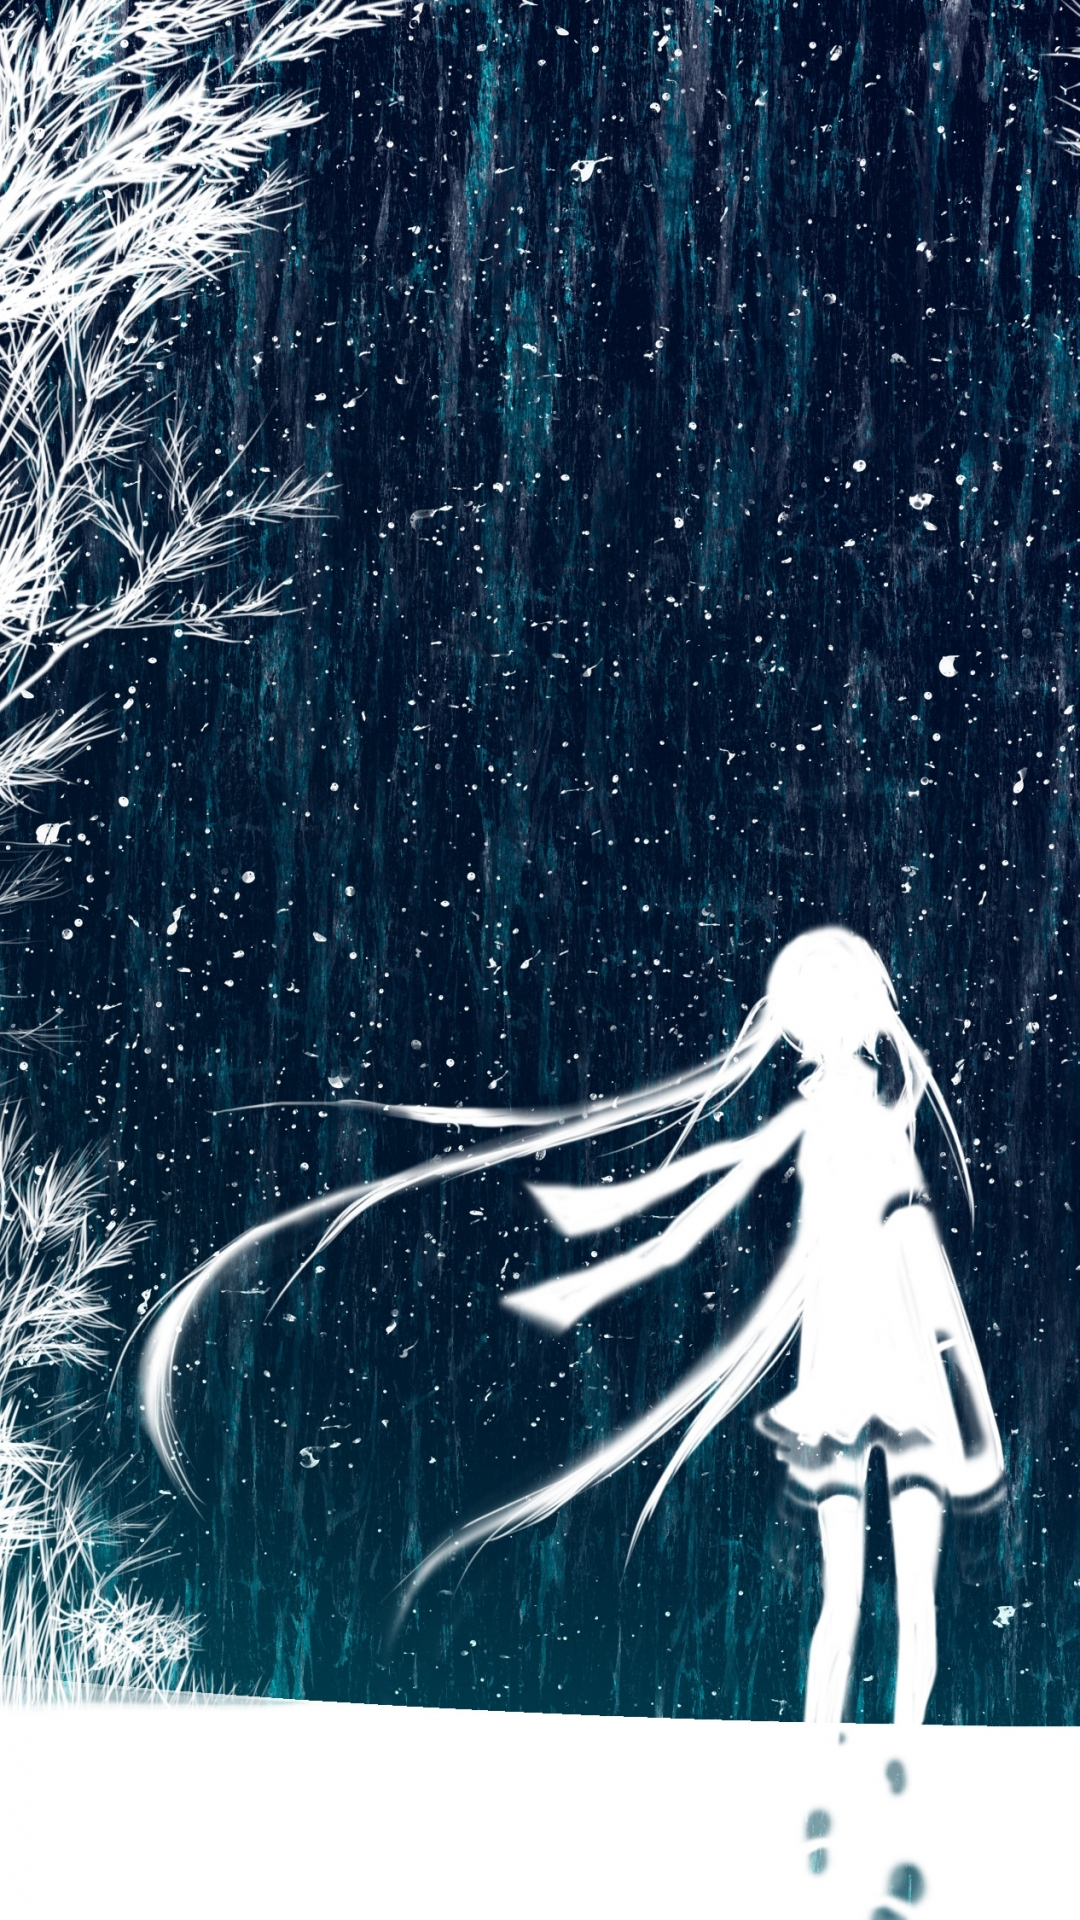 Pic Hwb3277 Anime Wallpaper Phone Dark 1080x1920 Wallpaper Teahub Io